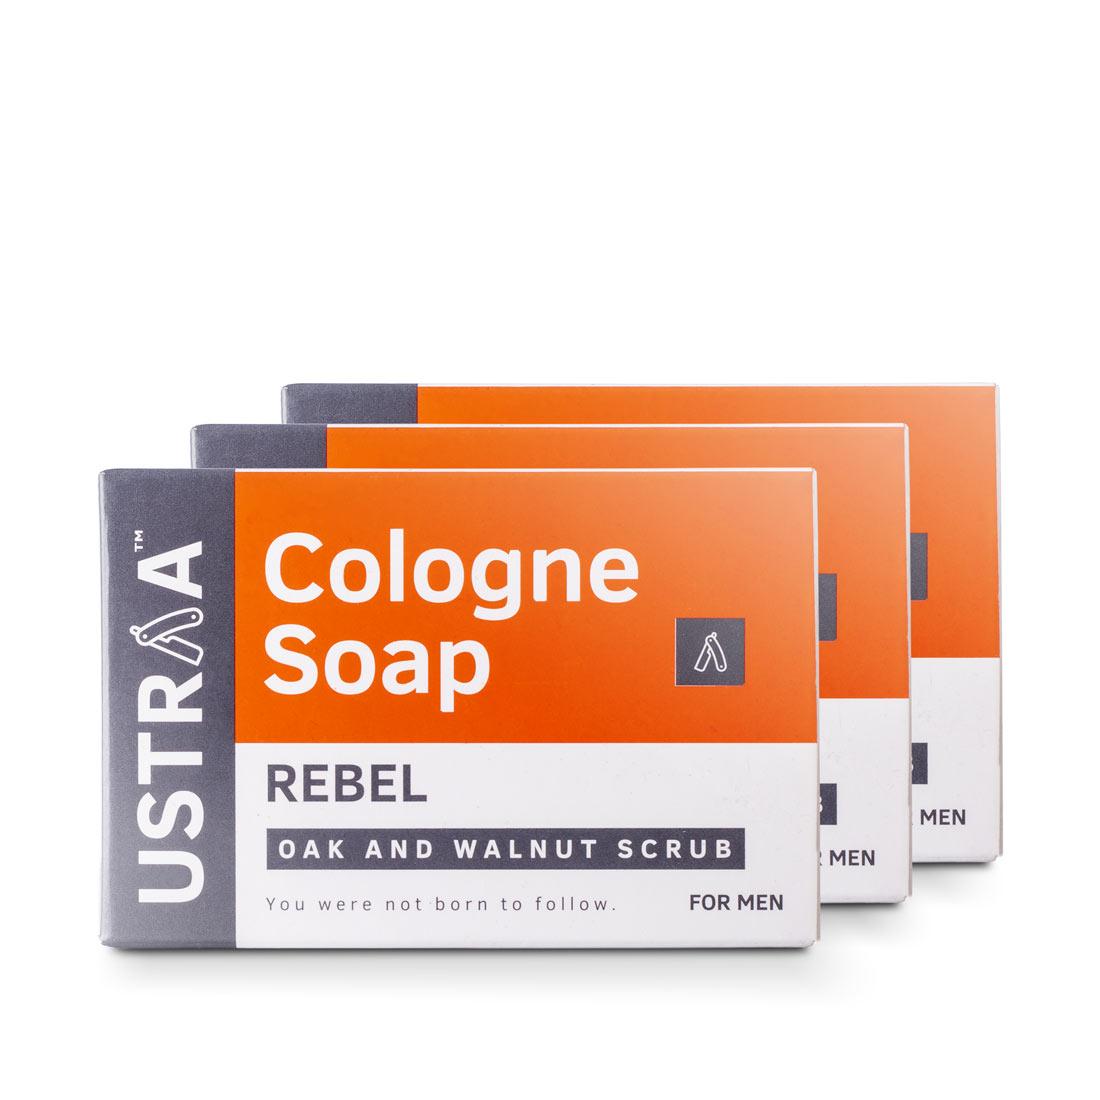 Ustraa | Ustraa Cologne Soap - Rebel (pack of 3)